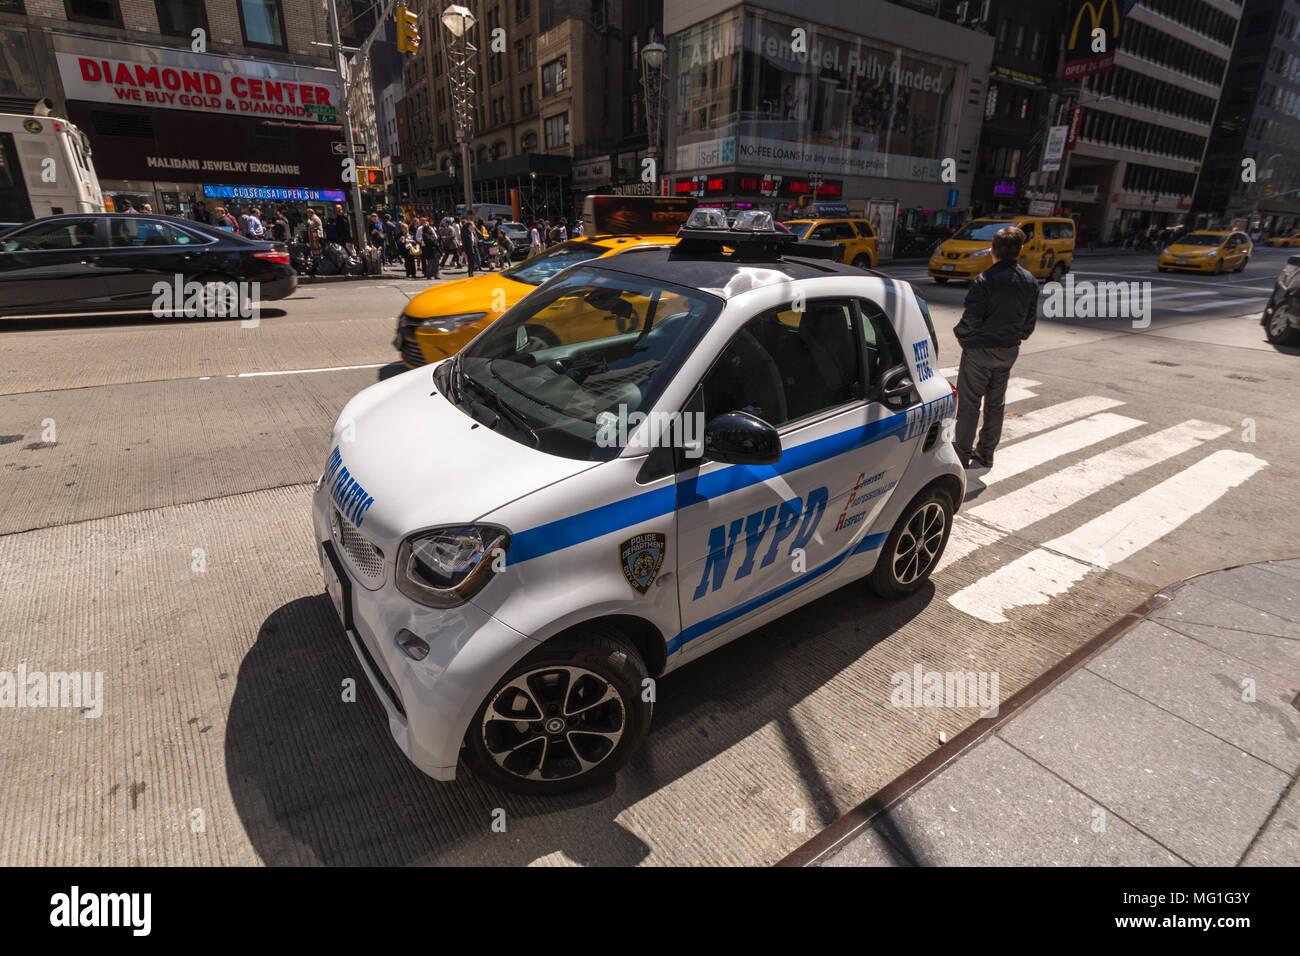 NYPD Smart Car Patrol Vehicle - Stock Image